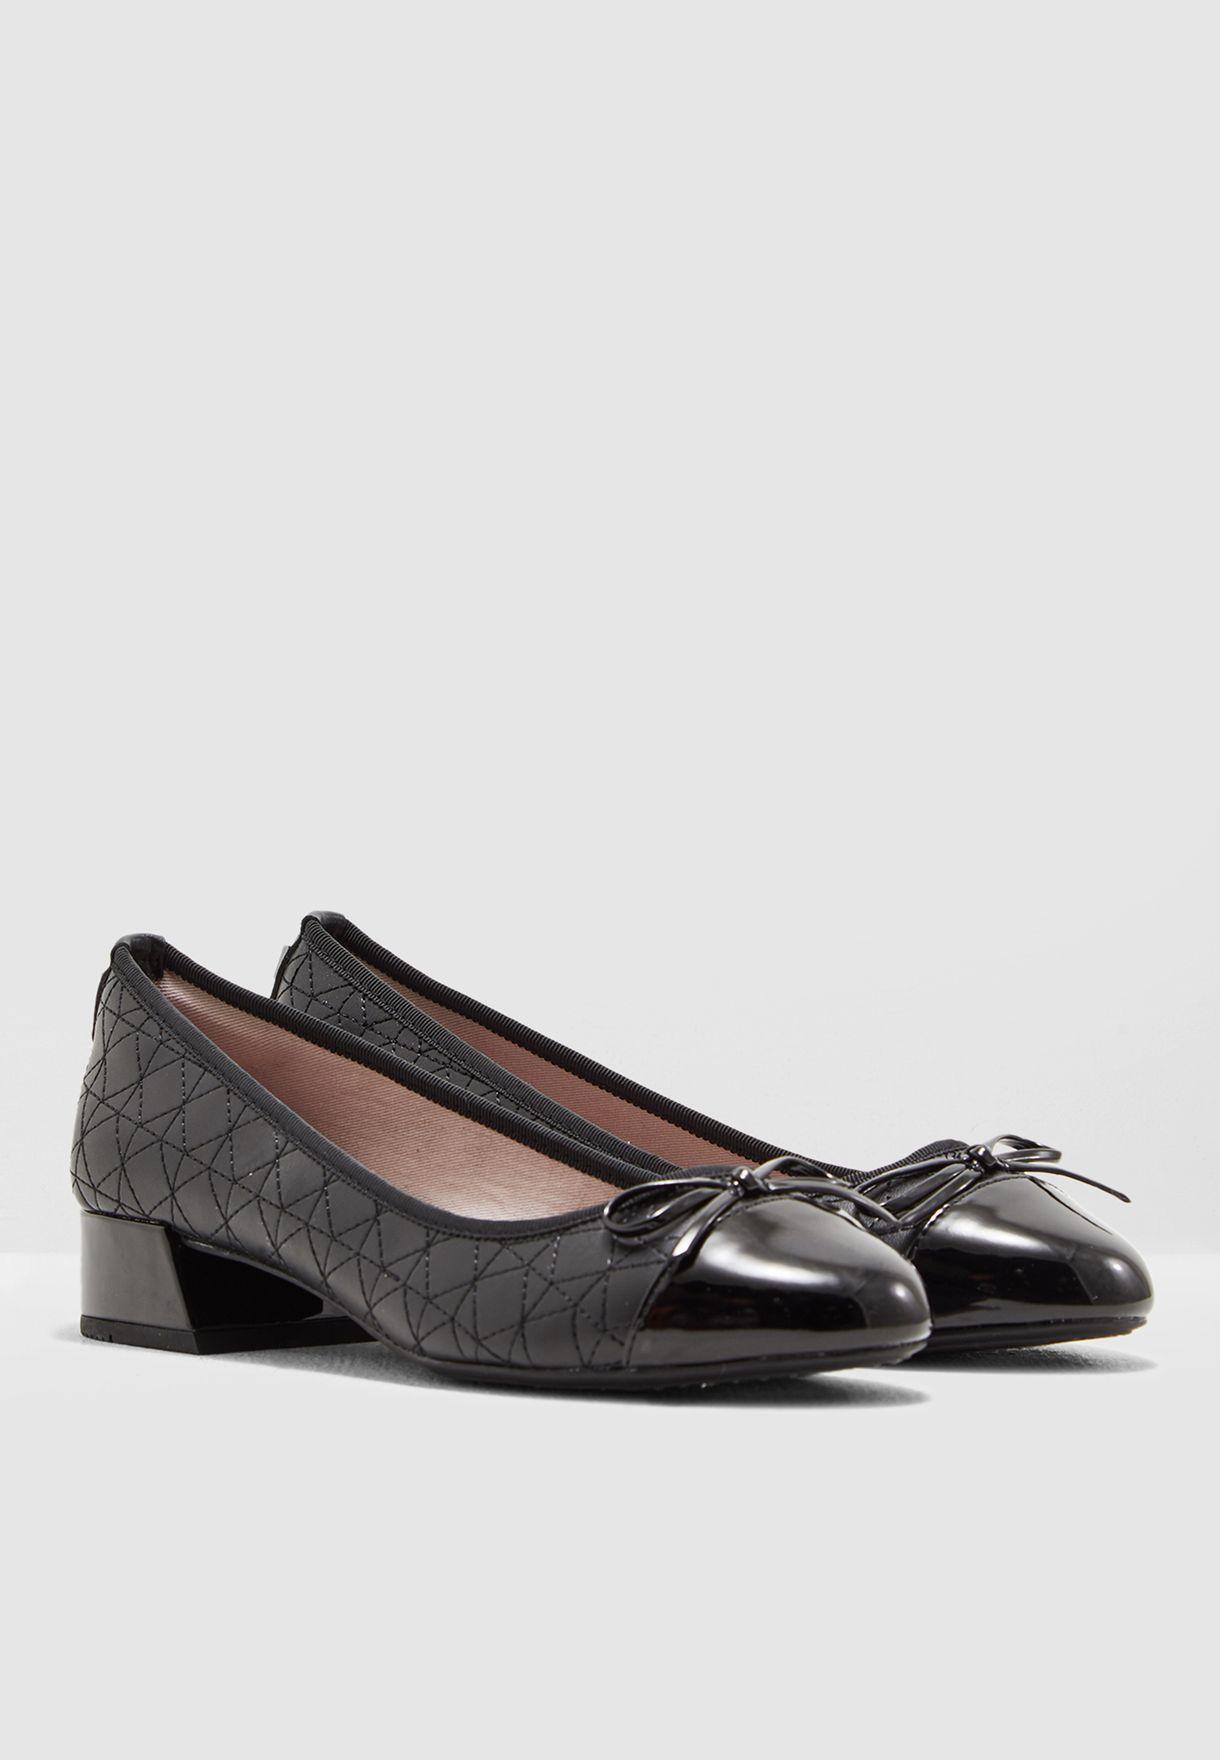 حذاء مدروز